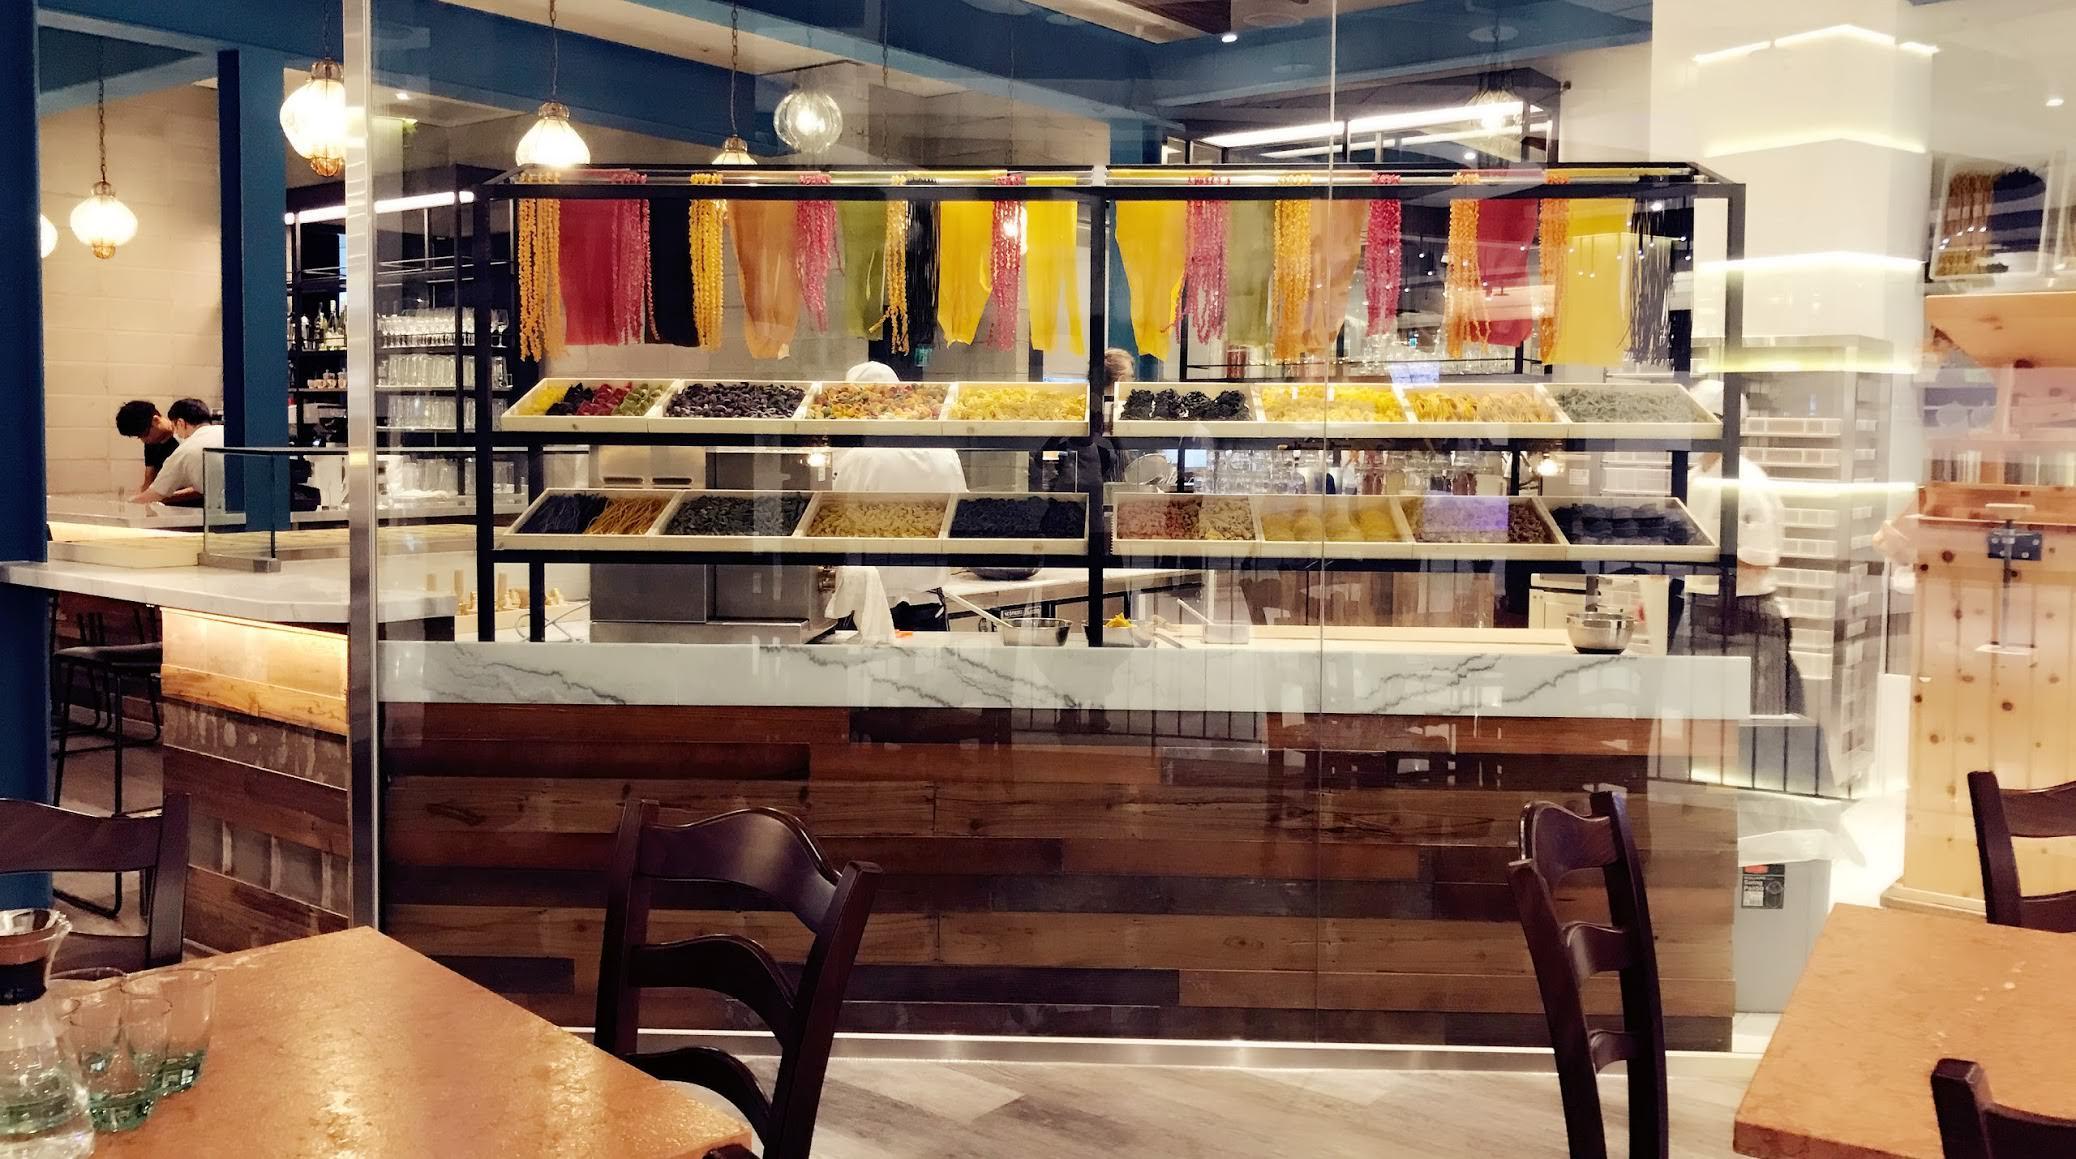 MOLINO手工義大利麵工場:小博物餐館的職人食感┃食記┃桃園┃中壢大江